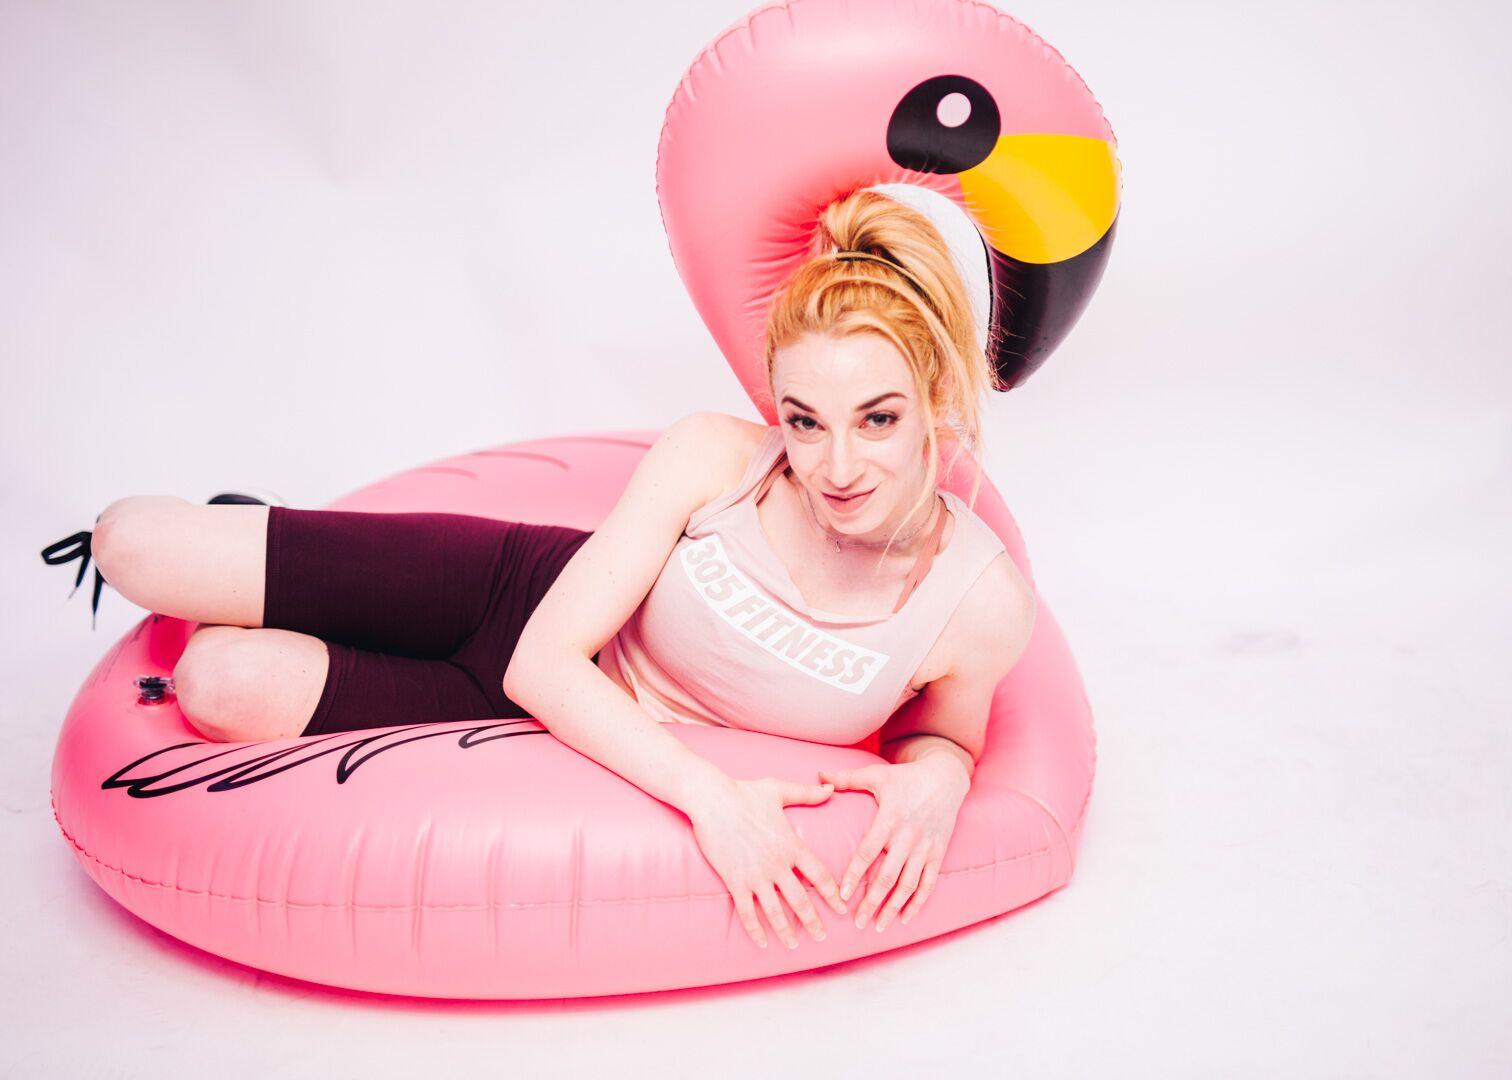 Photo of Bex With Flamingo Float Dance Cardio Live Dj.jpg